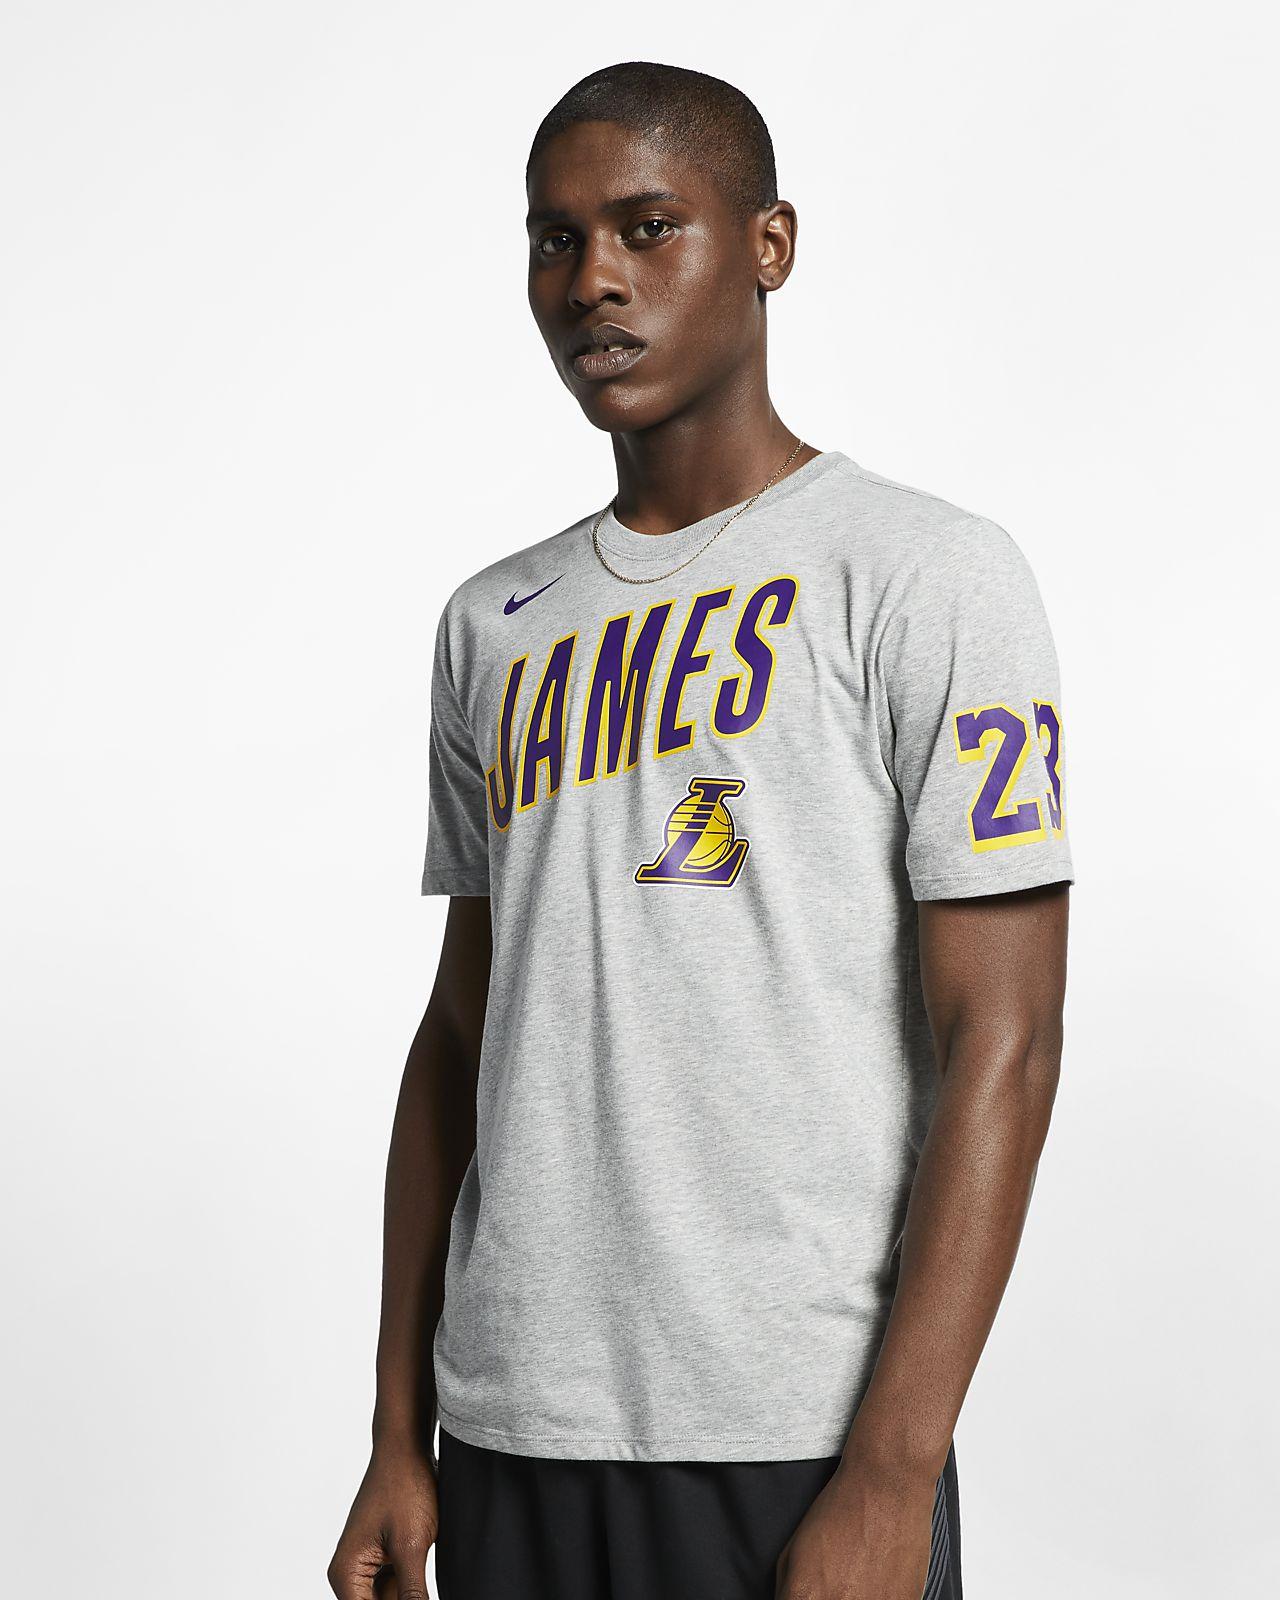 d3e6a7ebc Los Angeles Lakers Nike Dri-FIT Men s NBA T-Shirt. Nike.com CA